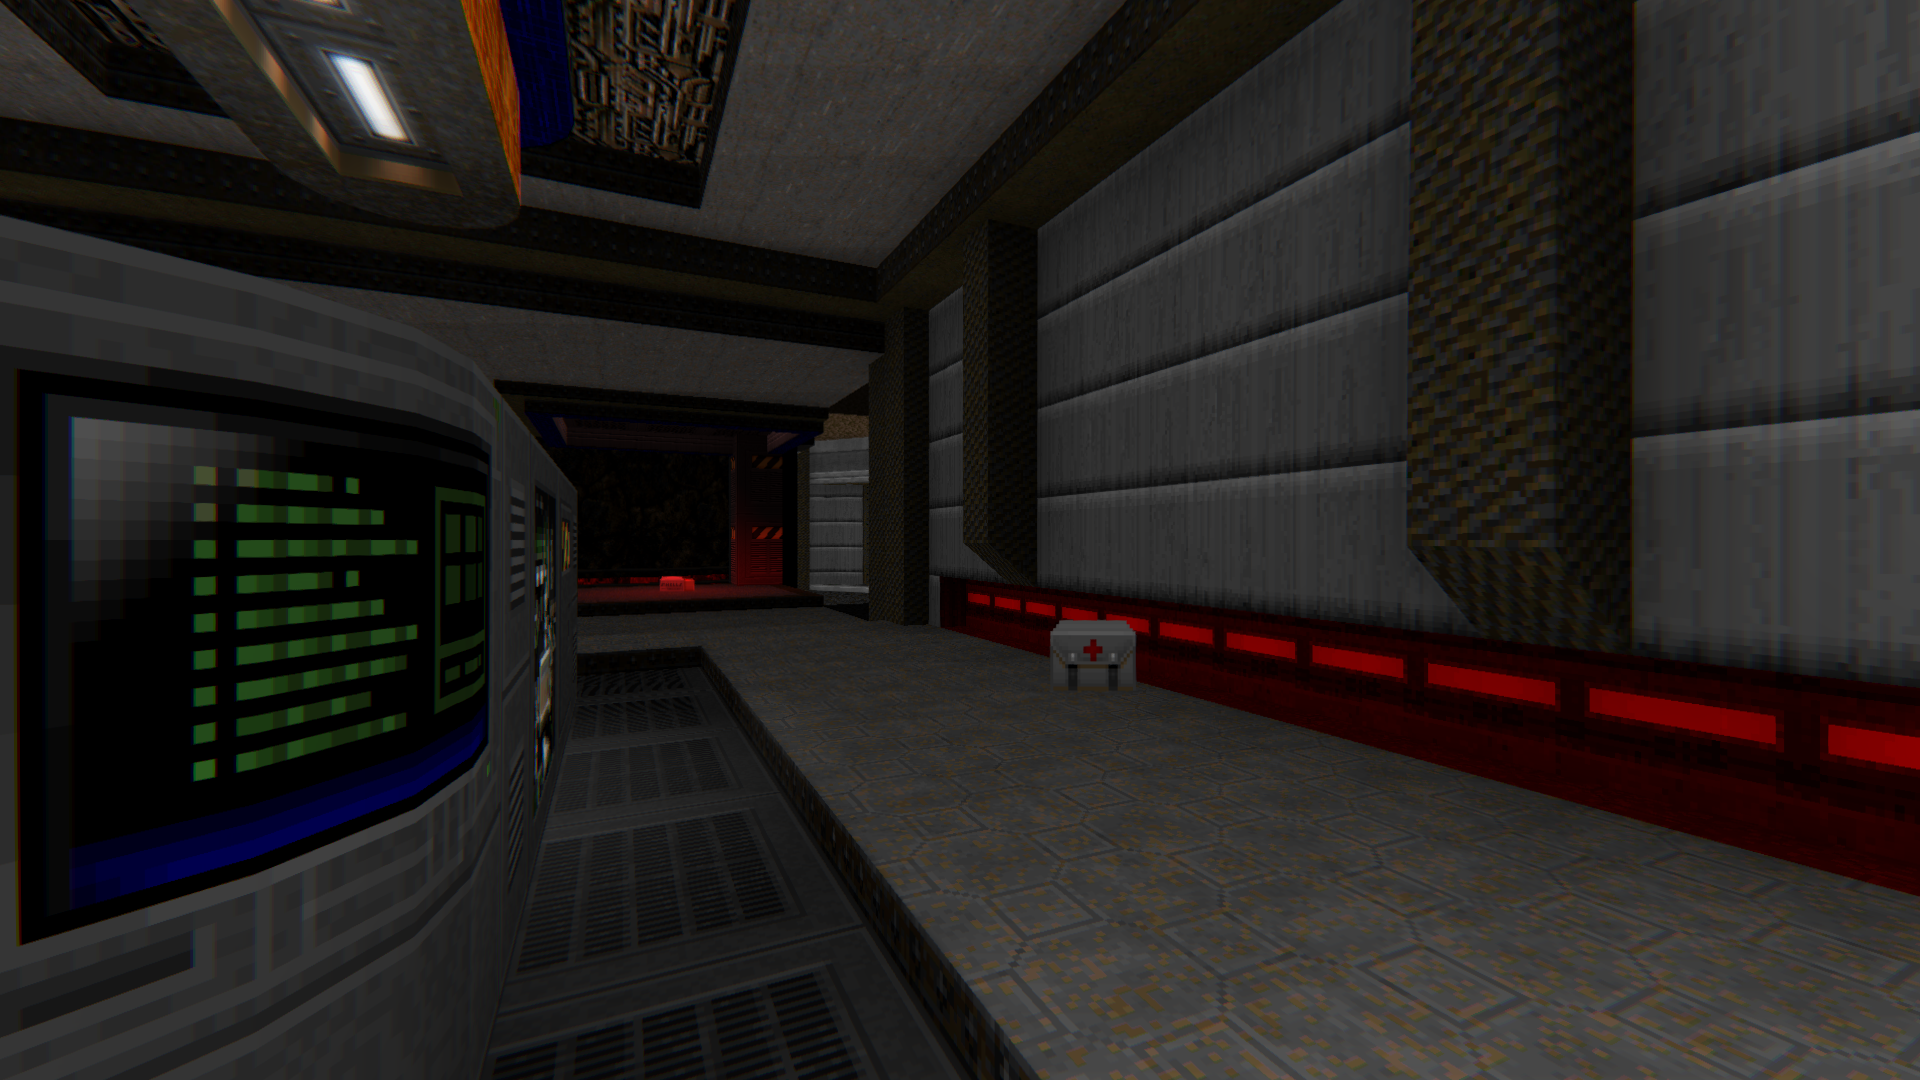 Screenshot_Doom_20210603_235435.png.b36796f975a14b9d1a93071f876275c0.png